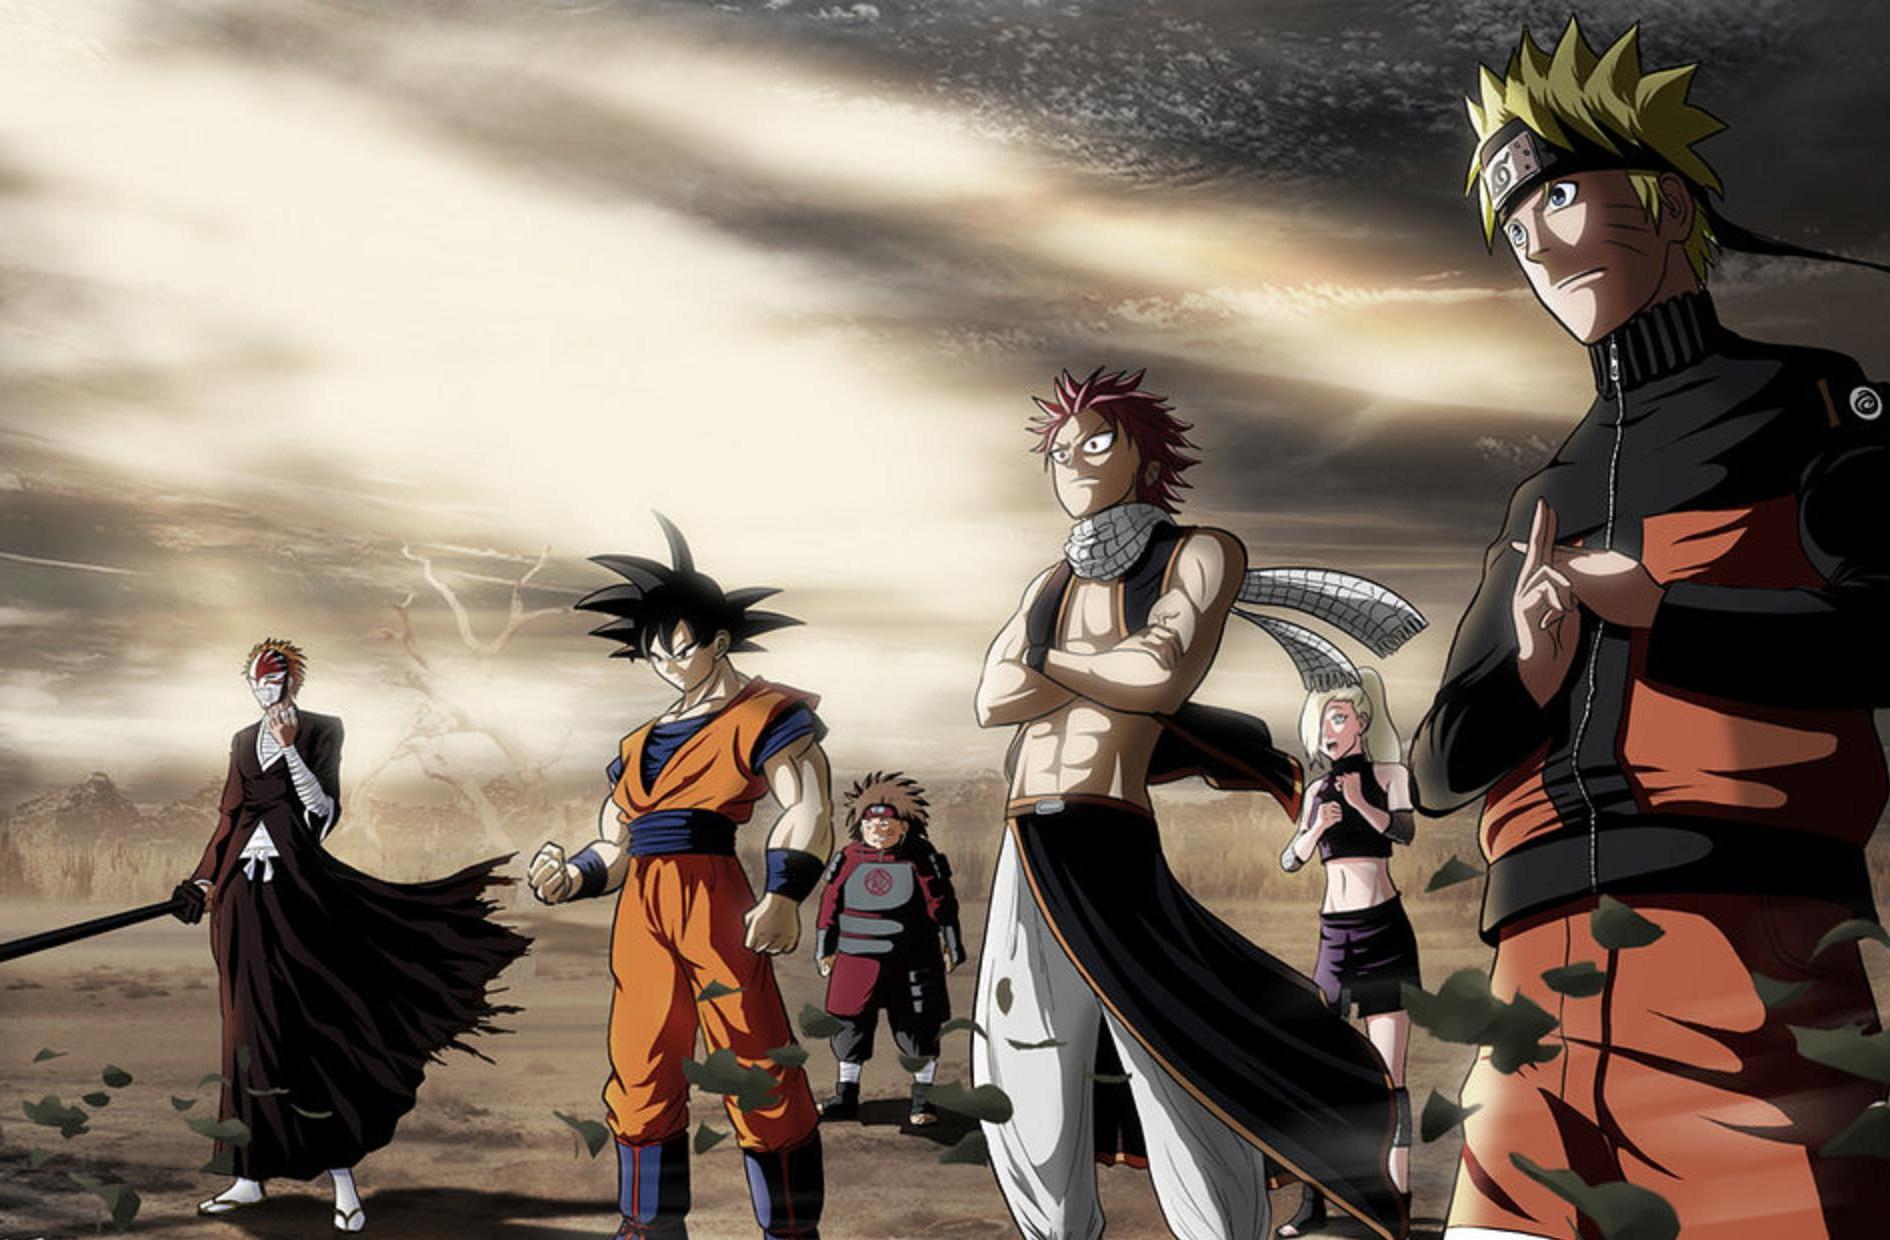 Naruto and Goku Wallpaper 1890x1240